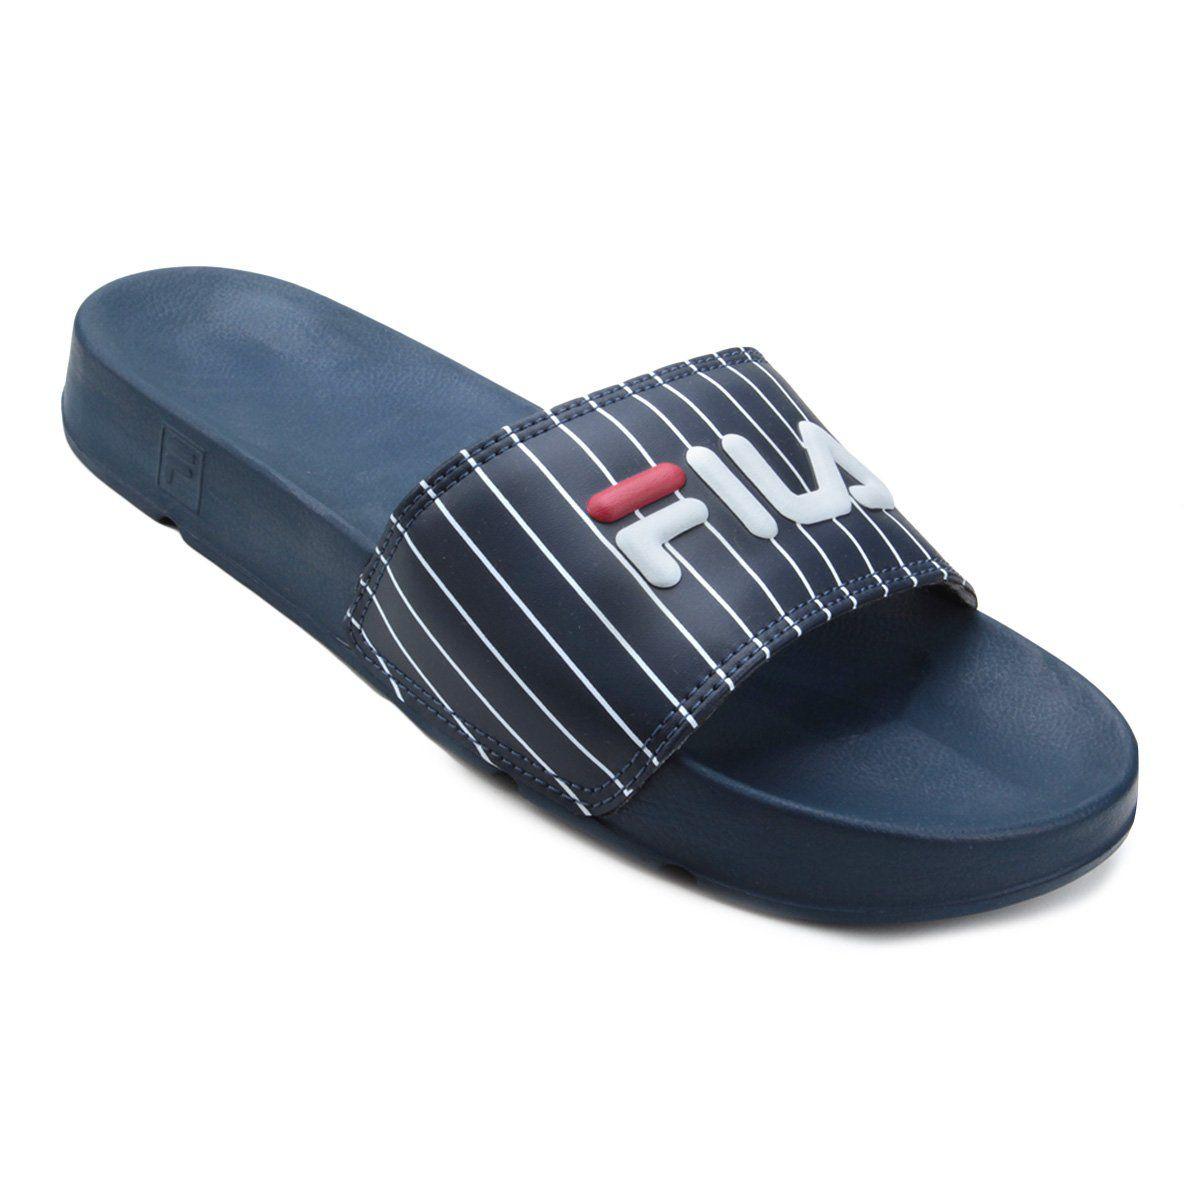 Chinelo Fila Drifter Basic Azul - Slide - Original